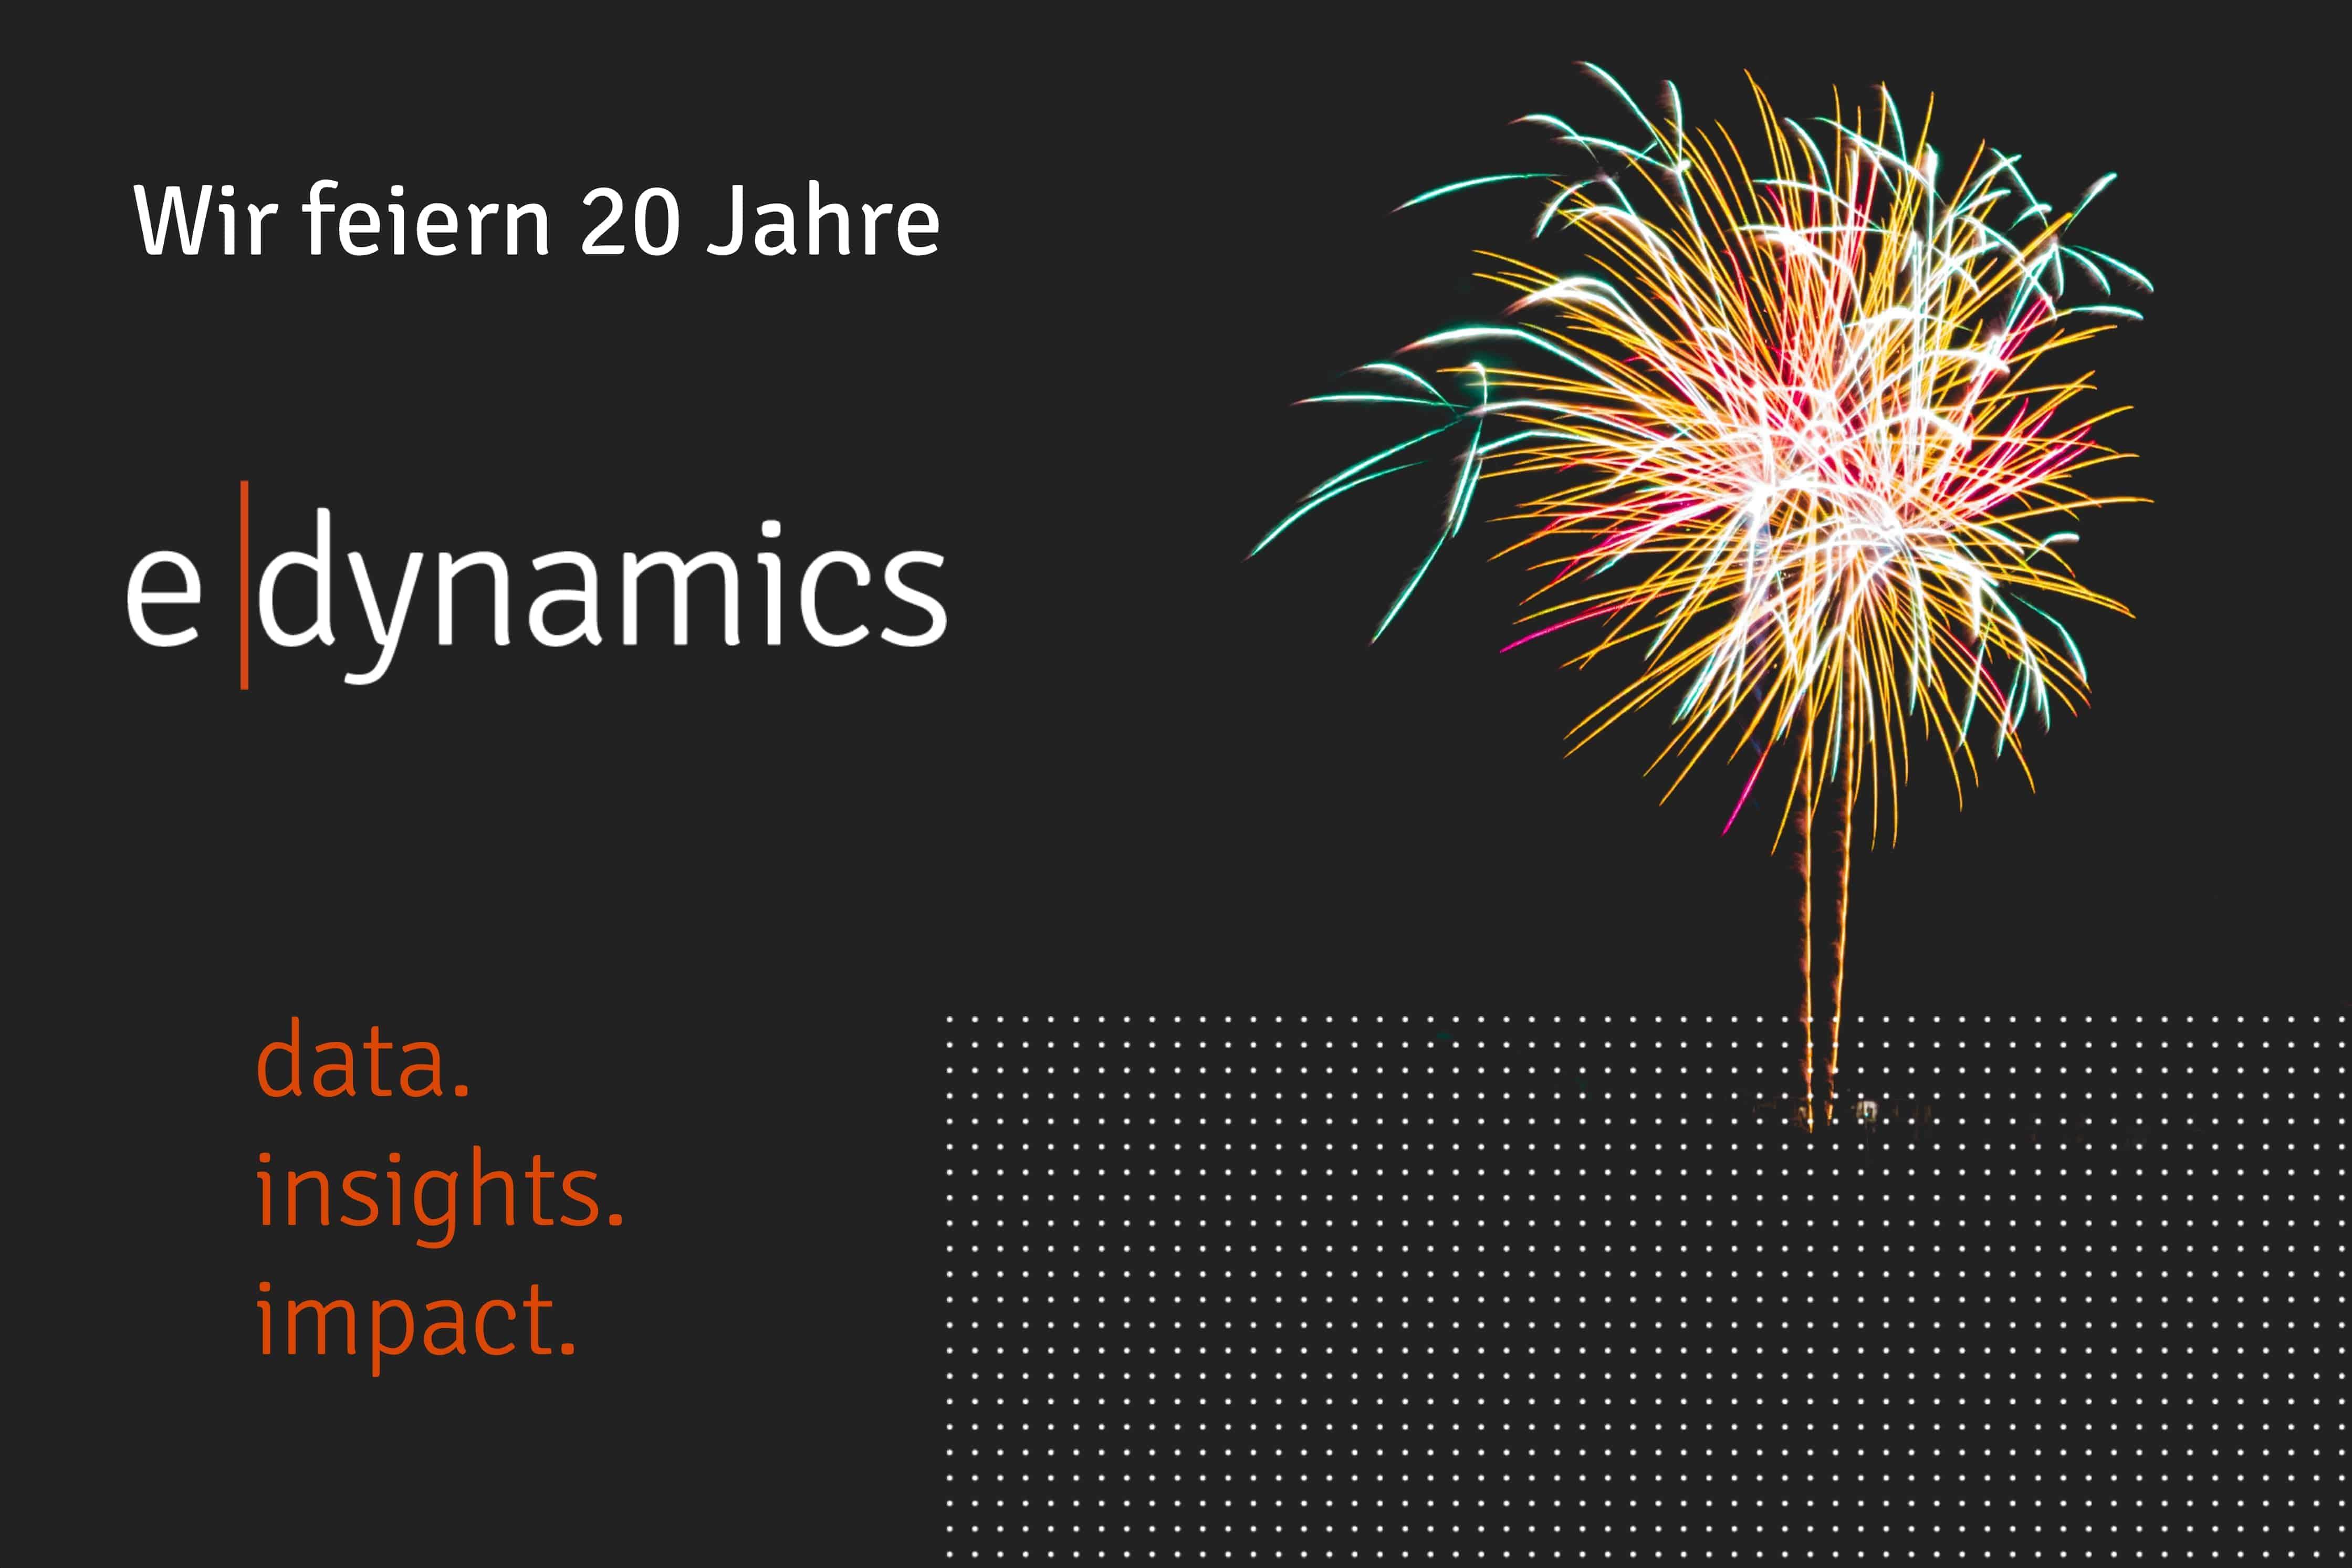 Firmenjubiläum 20 Jahre e-dynamics GmbH